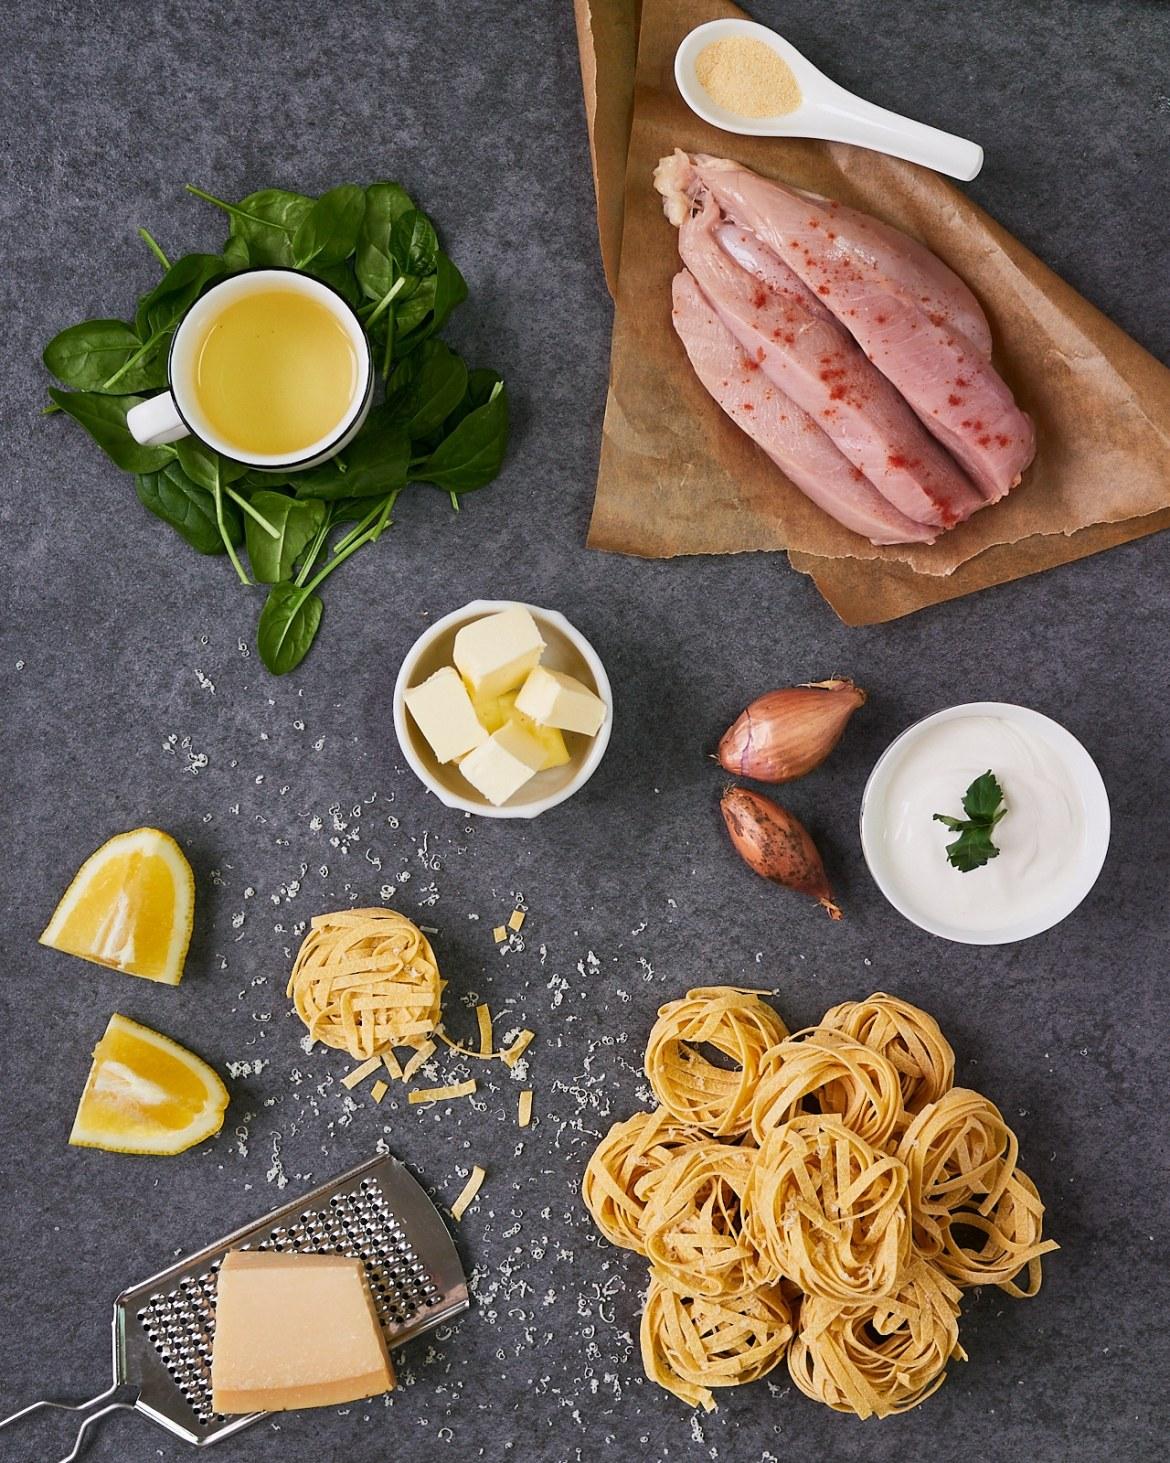 ingredients for lemon chicken pasta